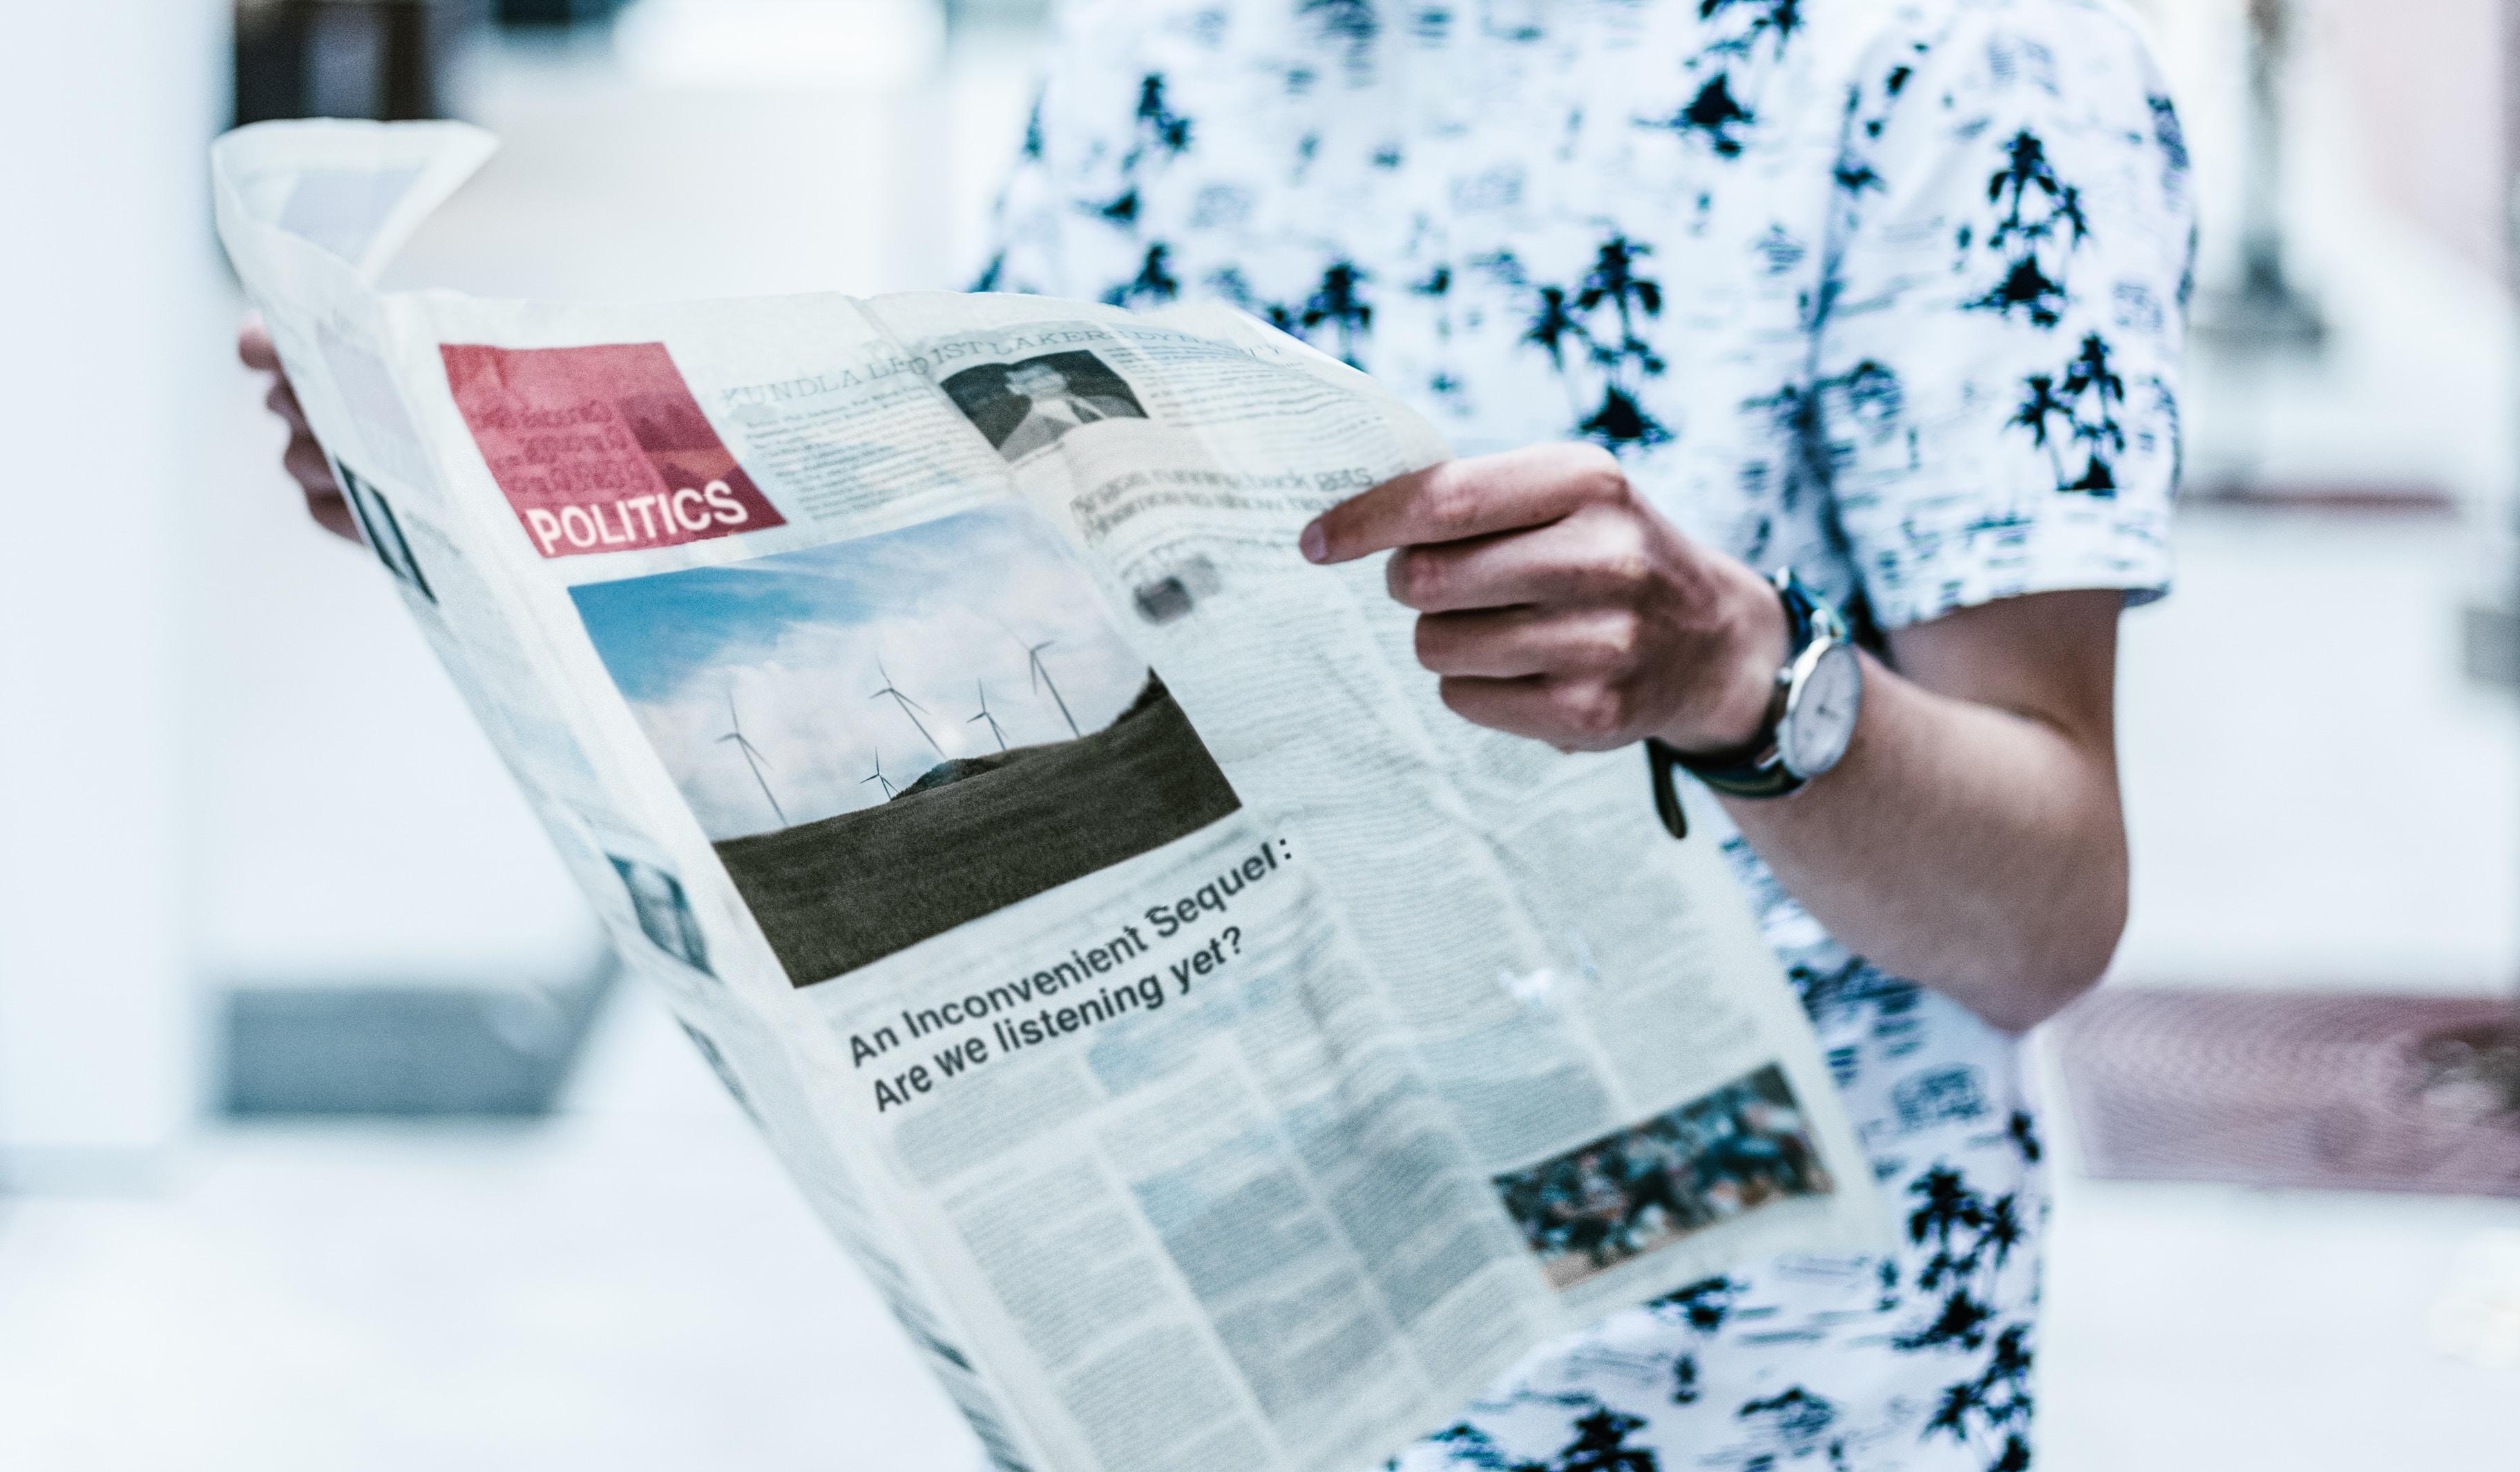 HyperLinq : Weekly Digital Asset Digest #9